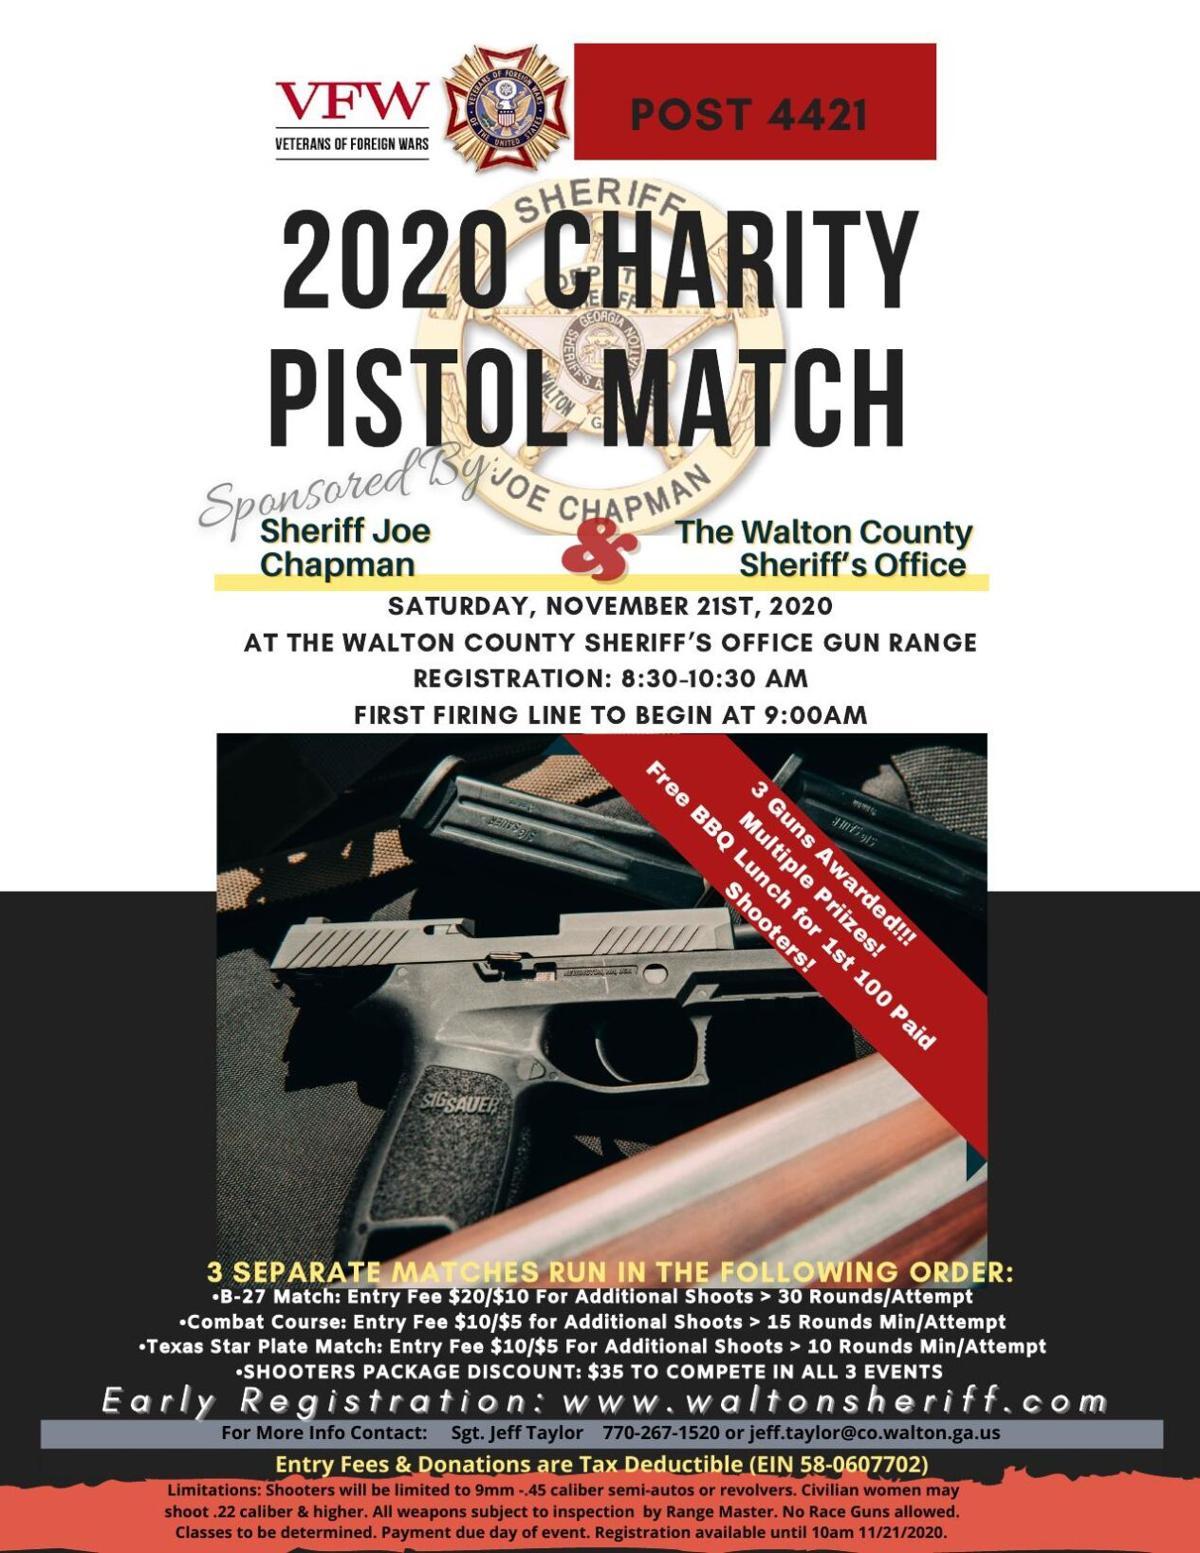 2020 Charity Pistol Match